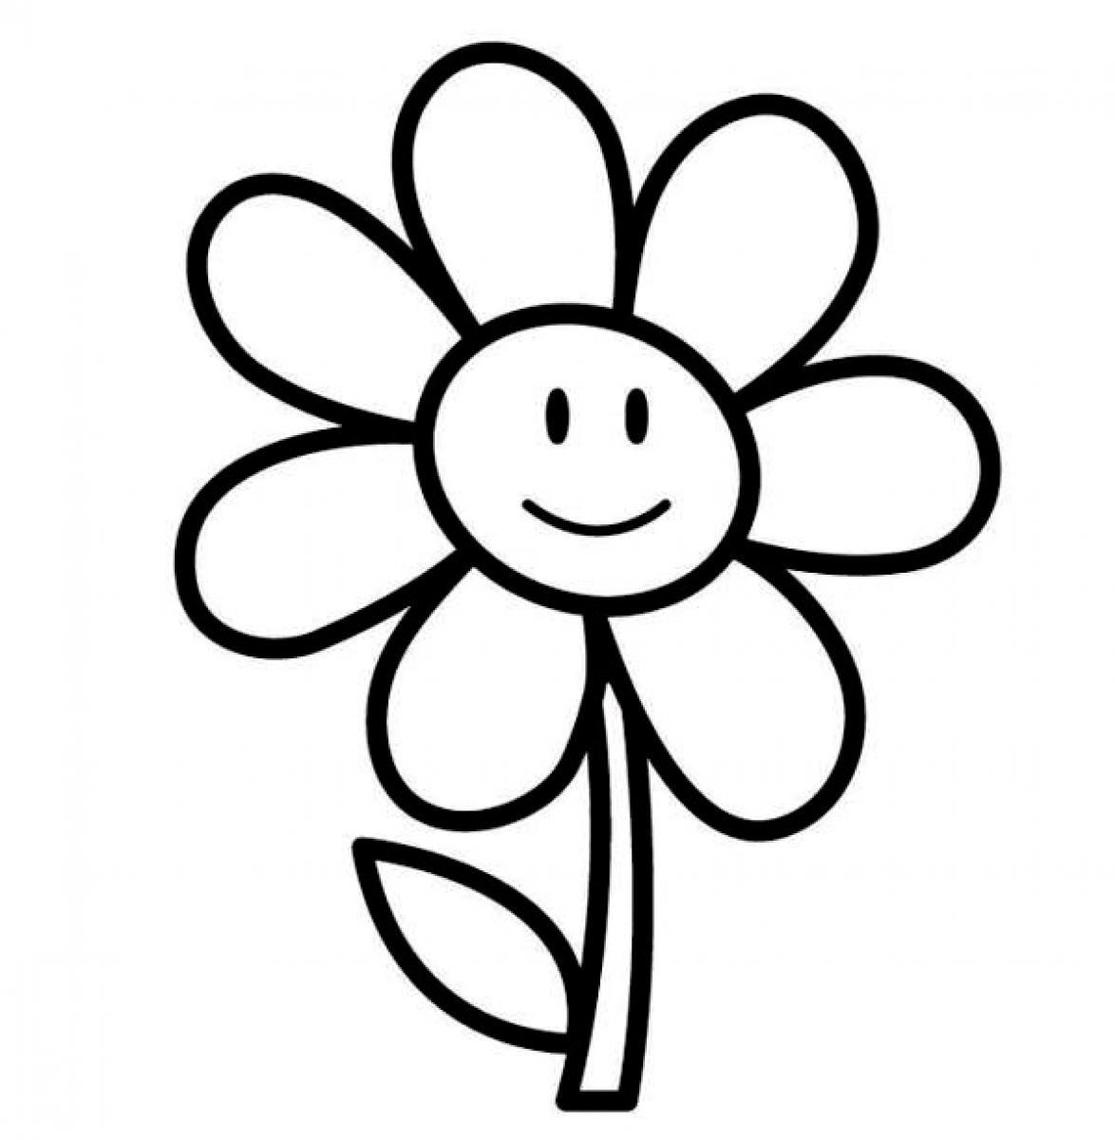 1115x1140 Free Black And White Flower Clip Art